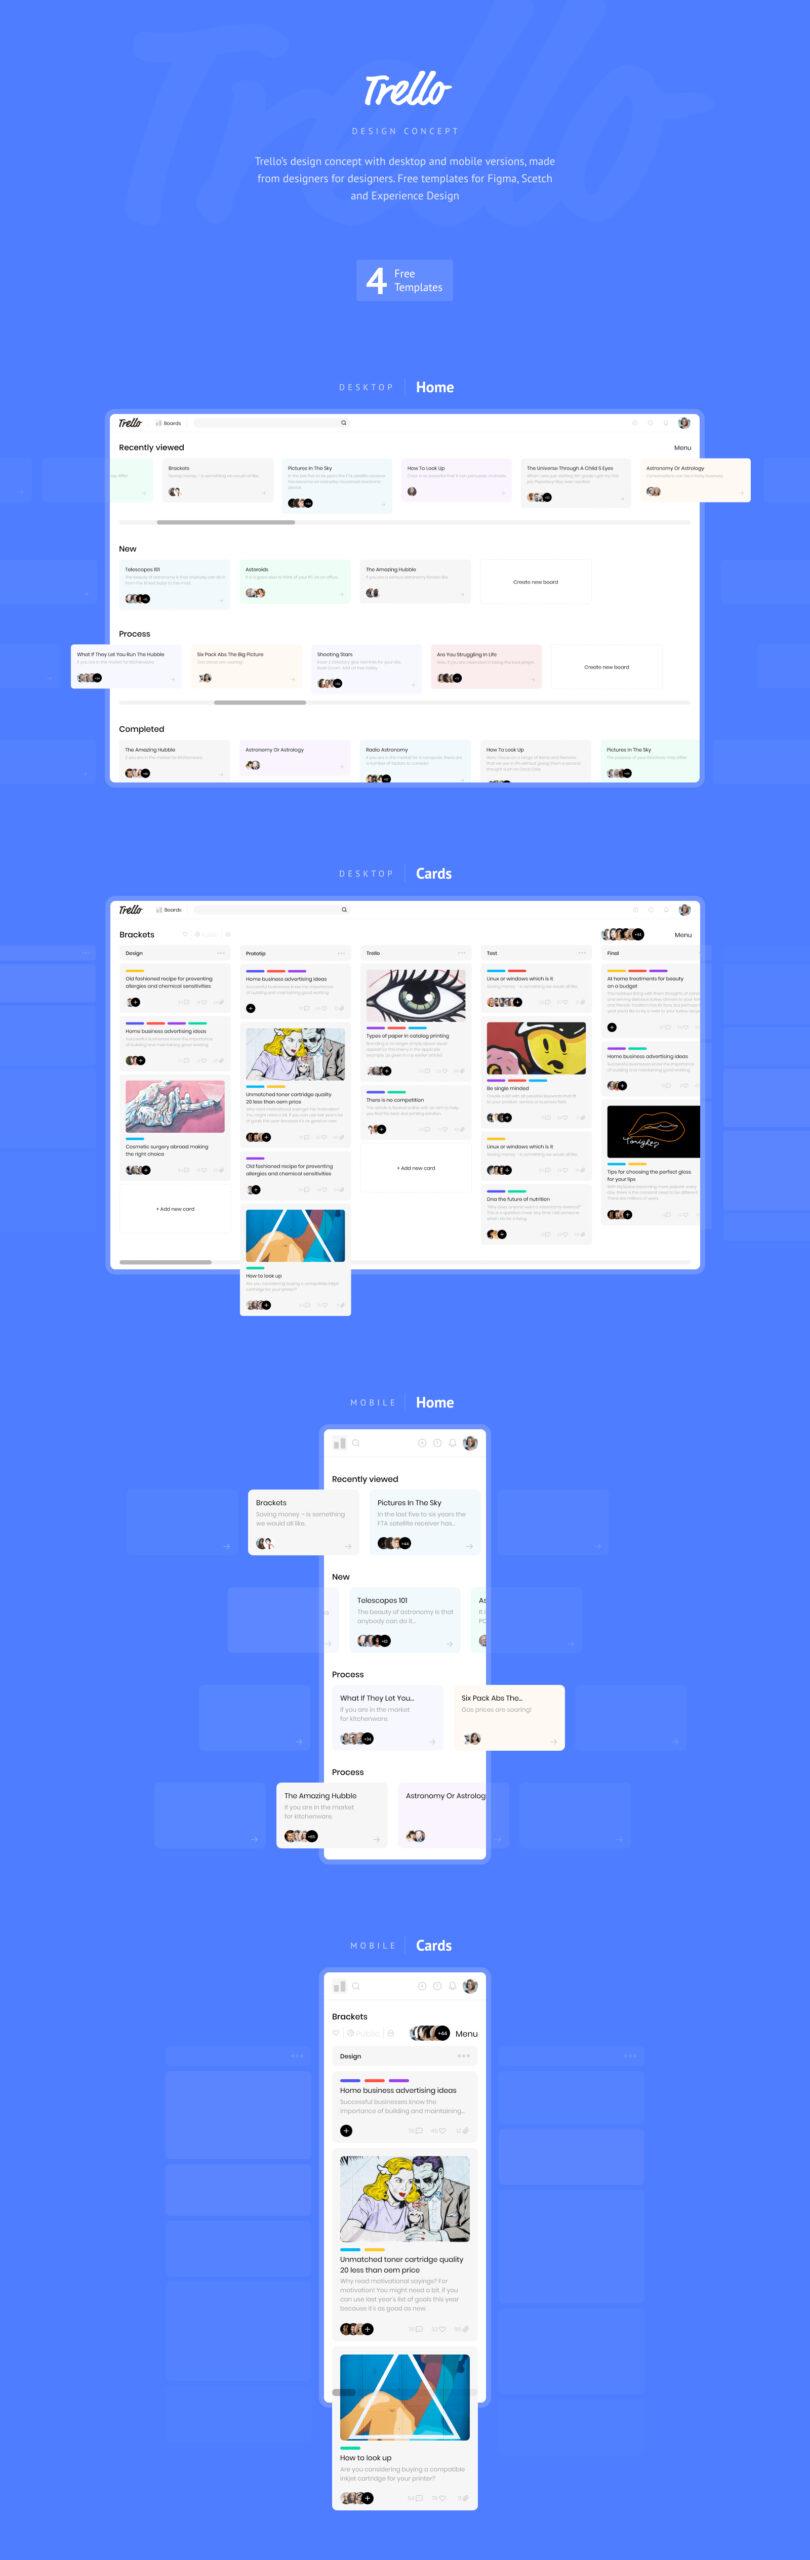 Trello概念设计移动端&桌面端UI设计套件 Trello Design Concept插图